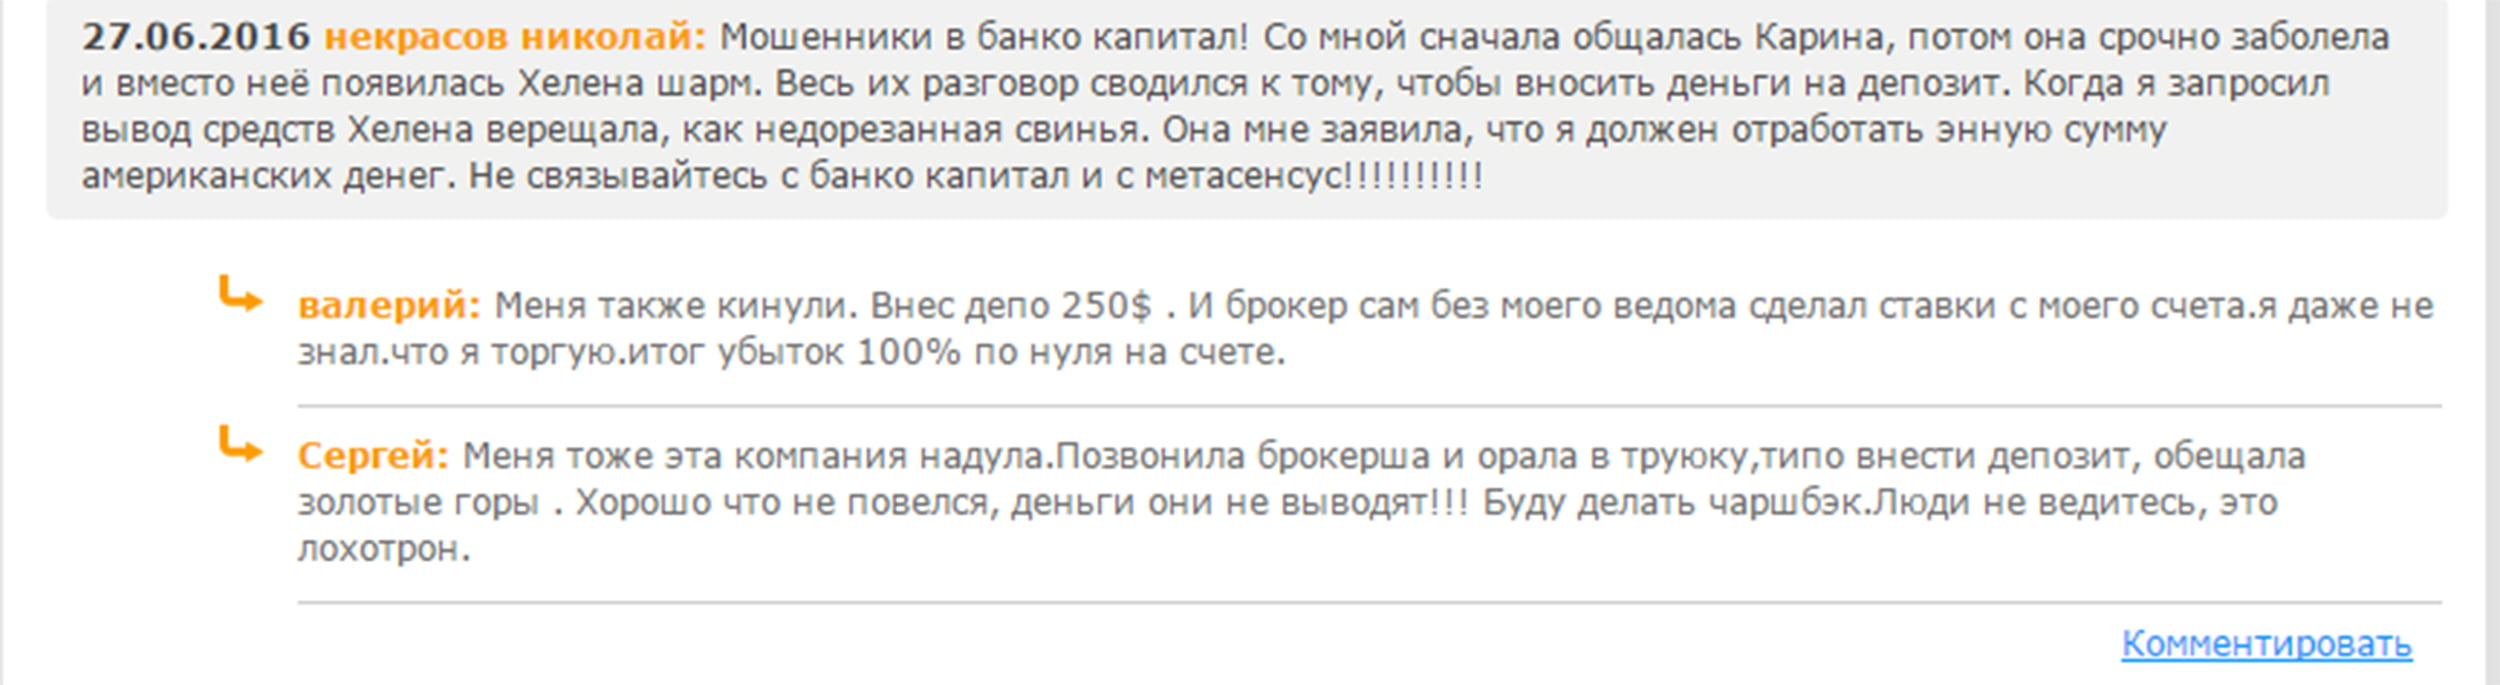 Banco-Capital отзывы